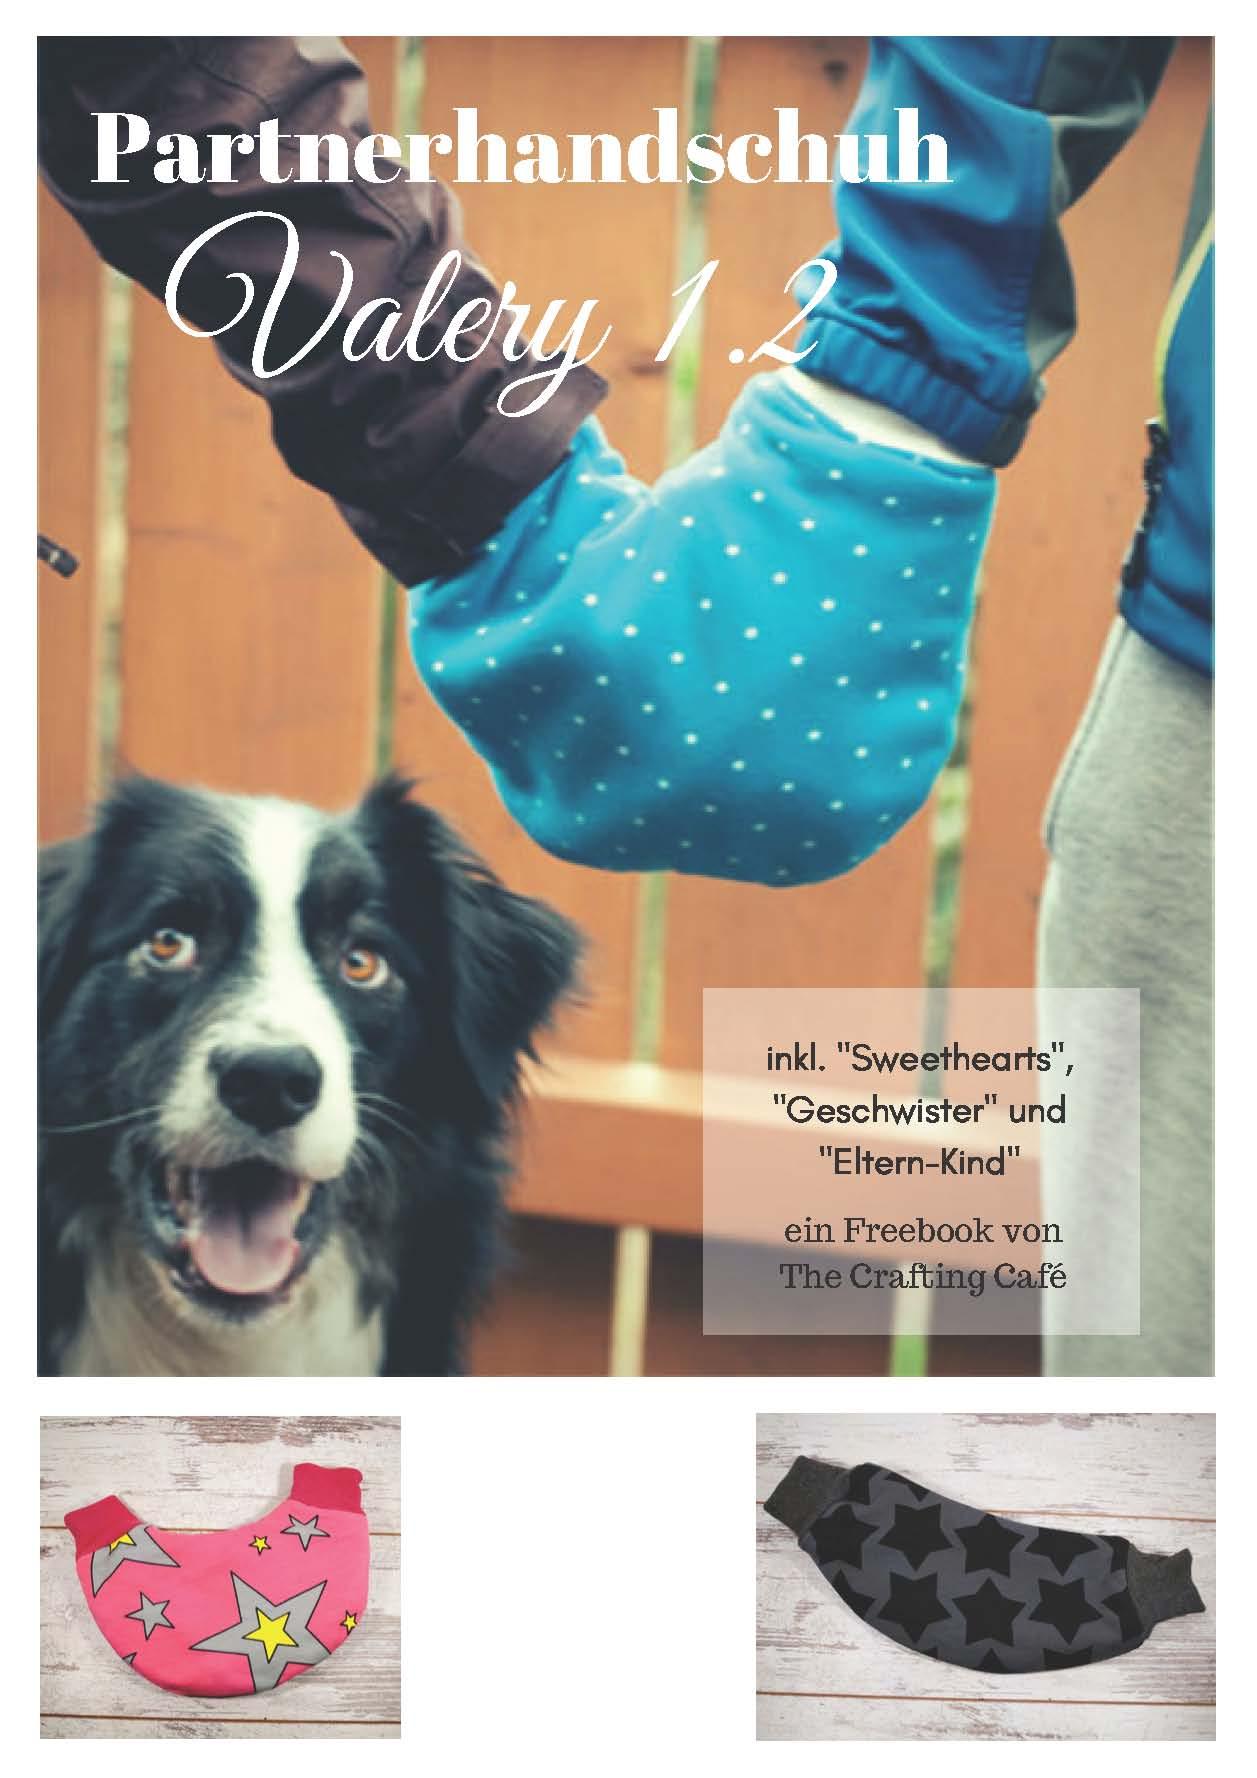 Freebook: Valery, der Partnerhandschuh 1.2 - HANDMADE Kultur